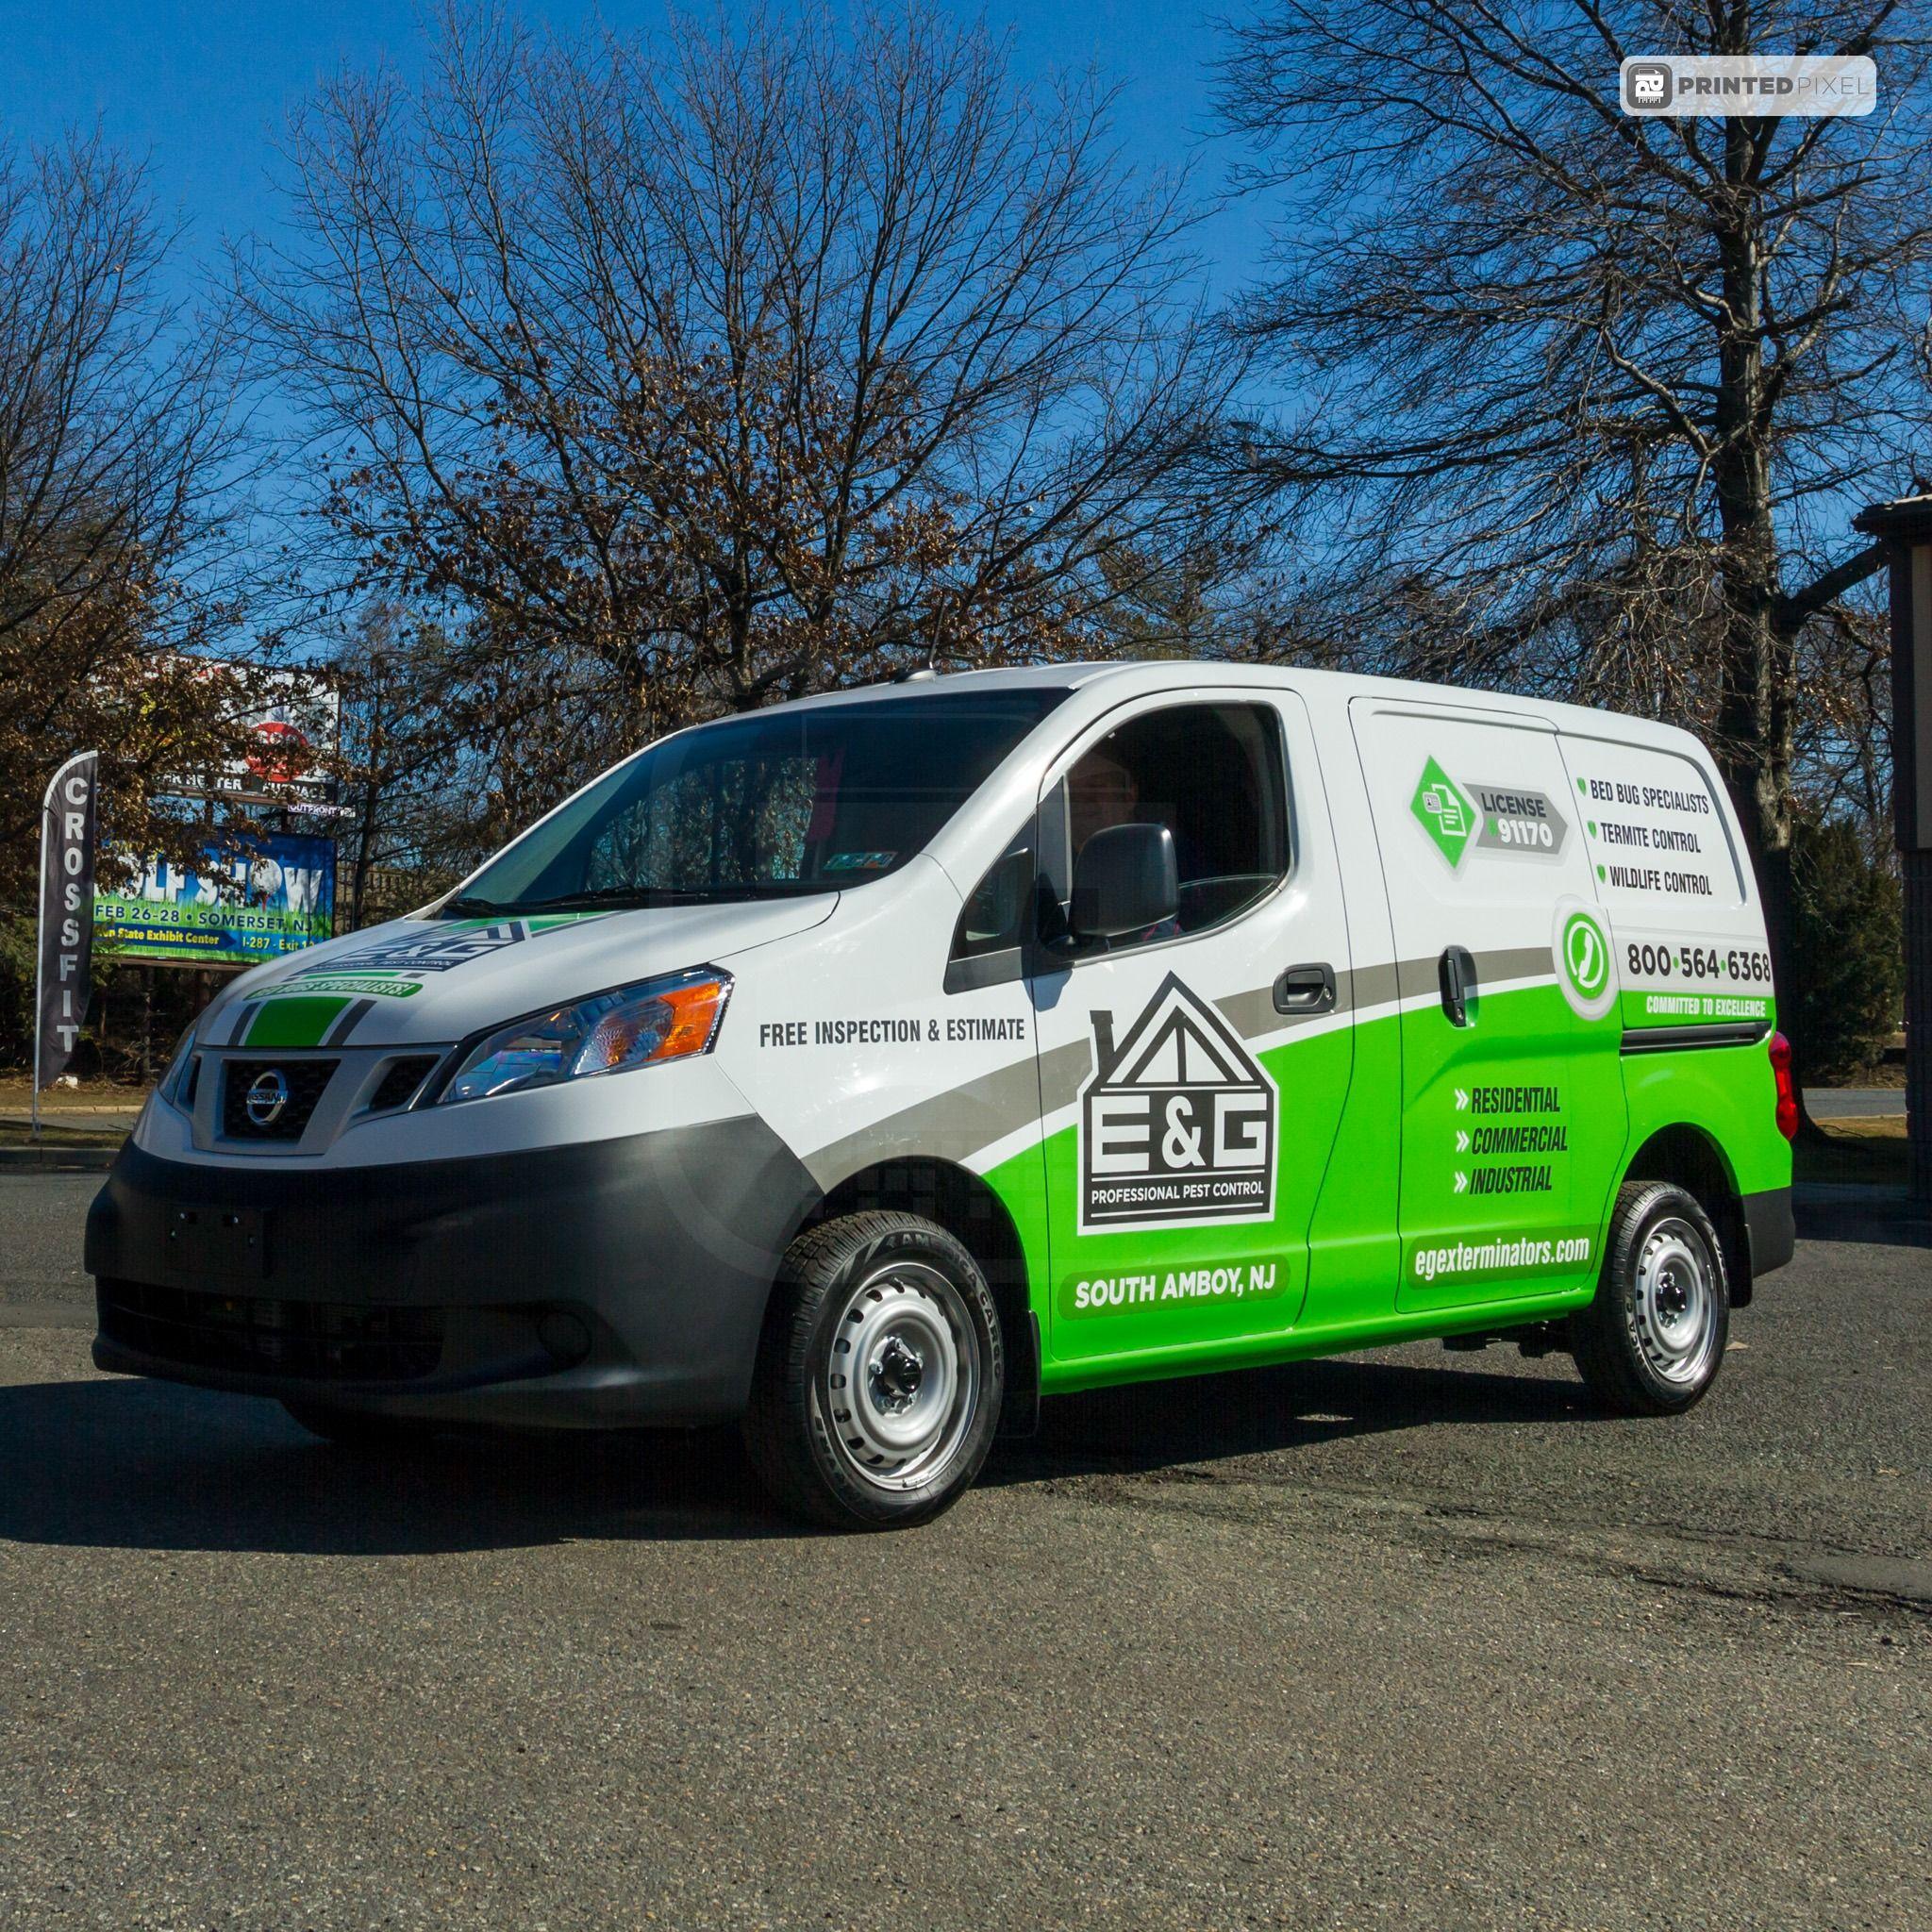 E G Professional Pest Control Van Wrap Truck Design Car Wrap Van Wrap